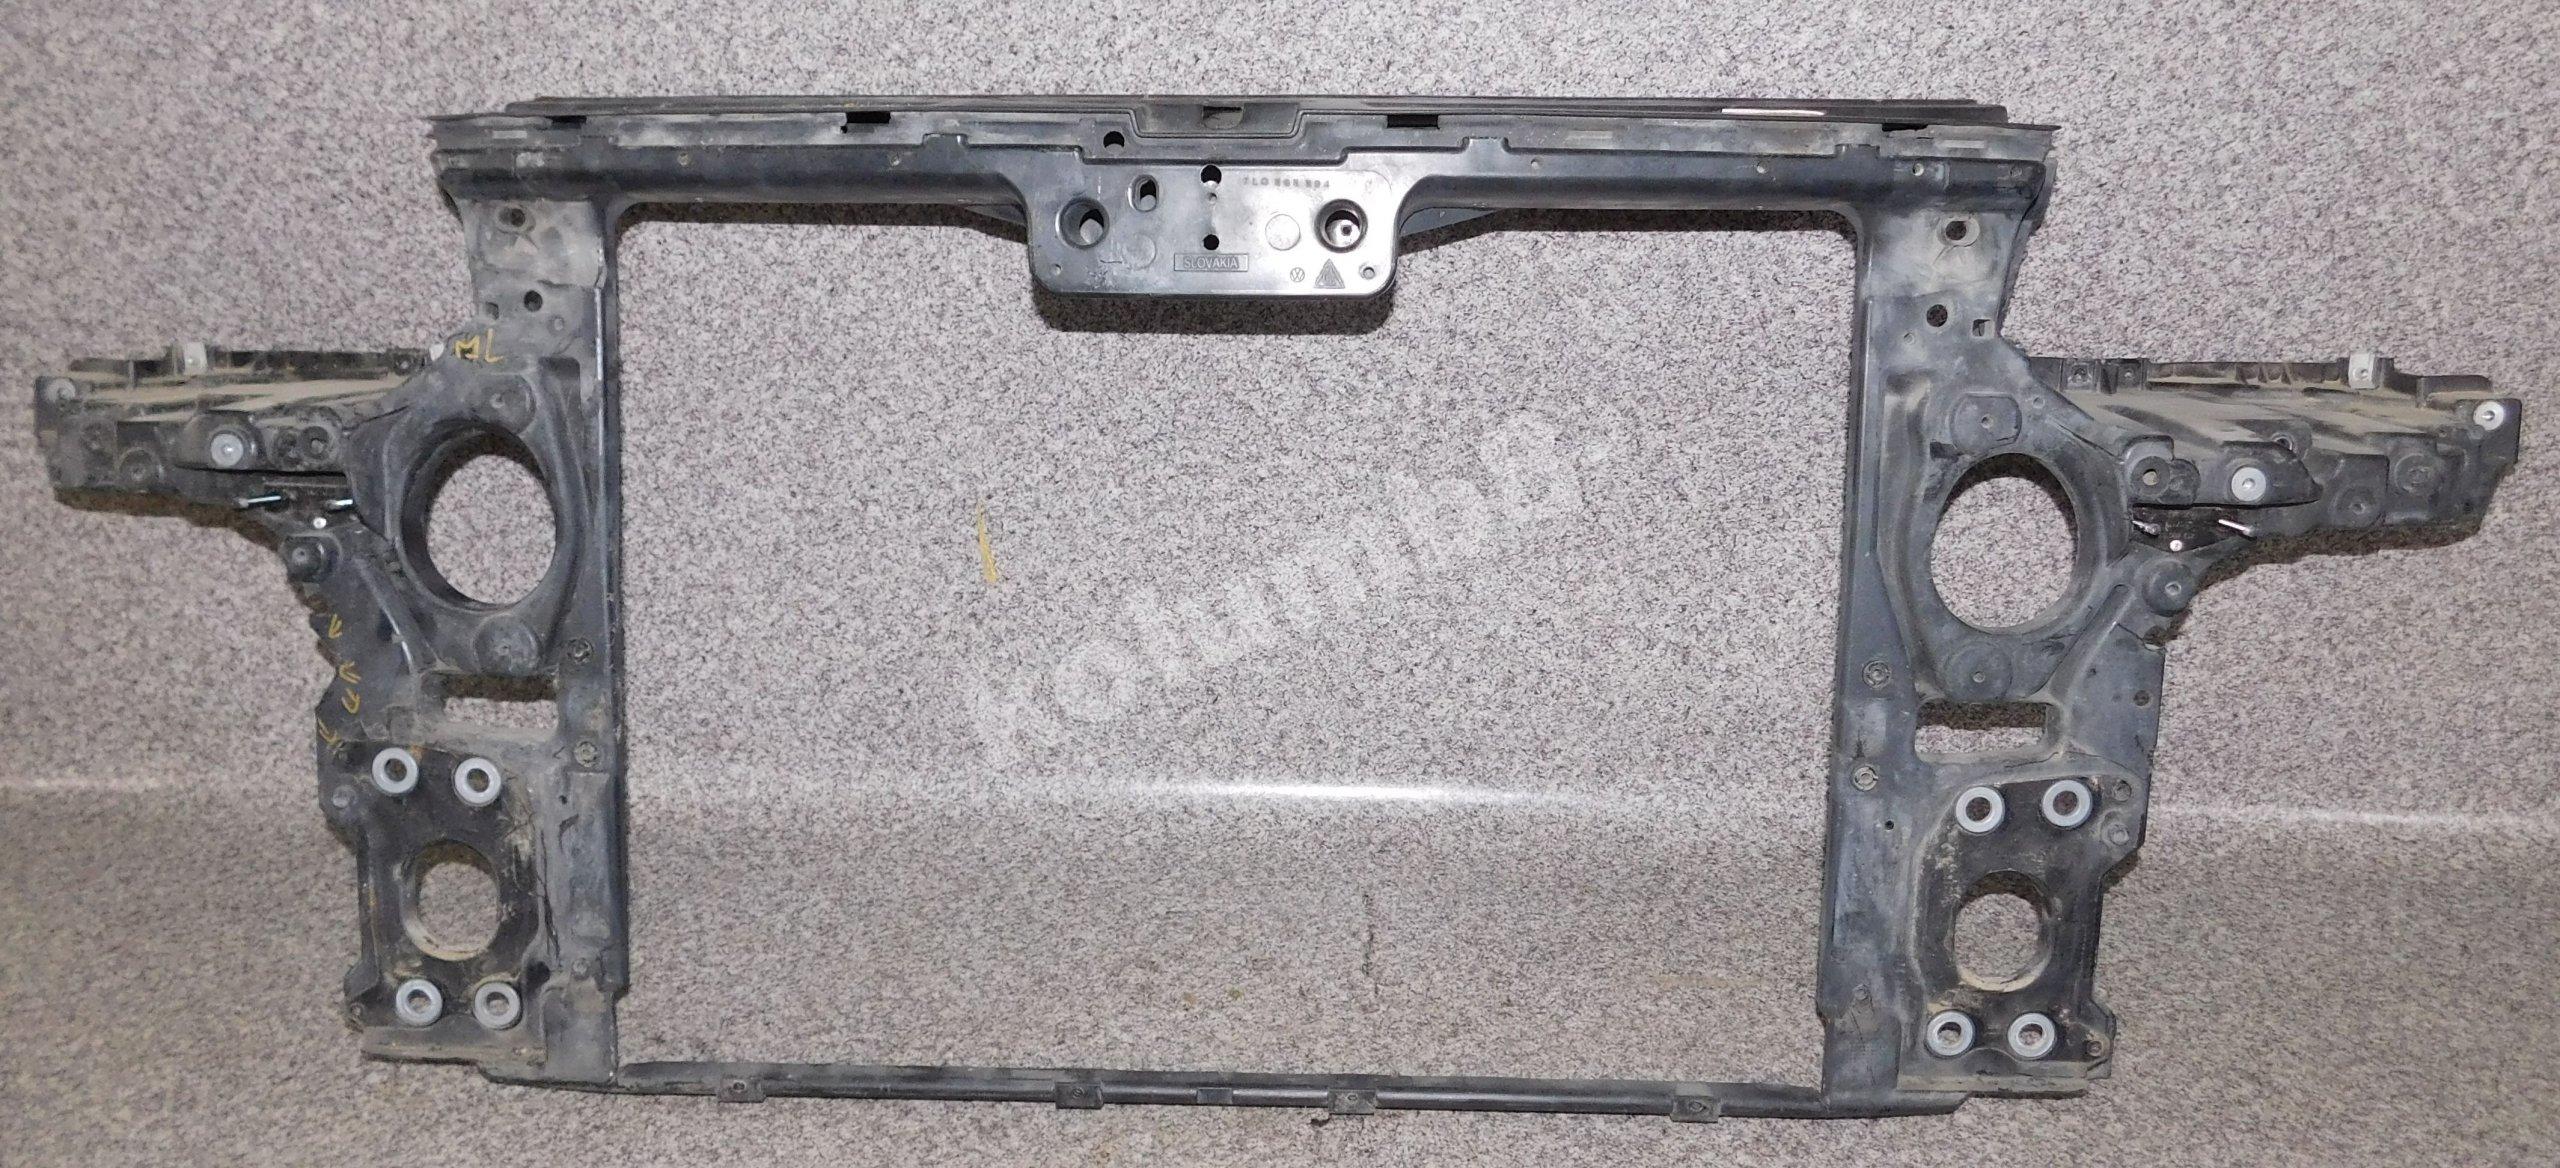 VW TOUAREG 7L0805594 FRONT BAR BEAMS 7L0